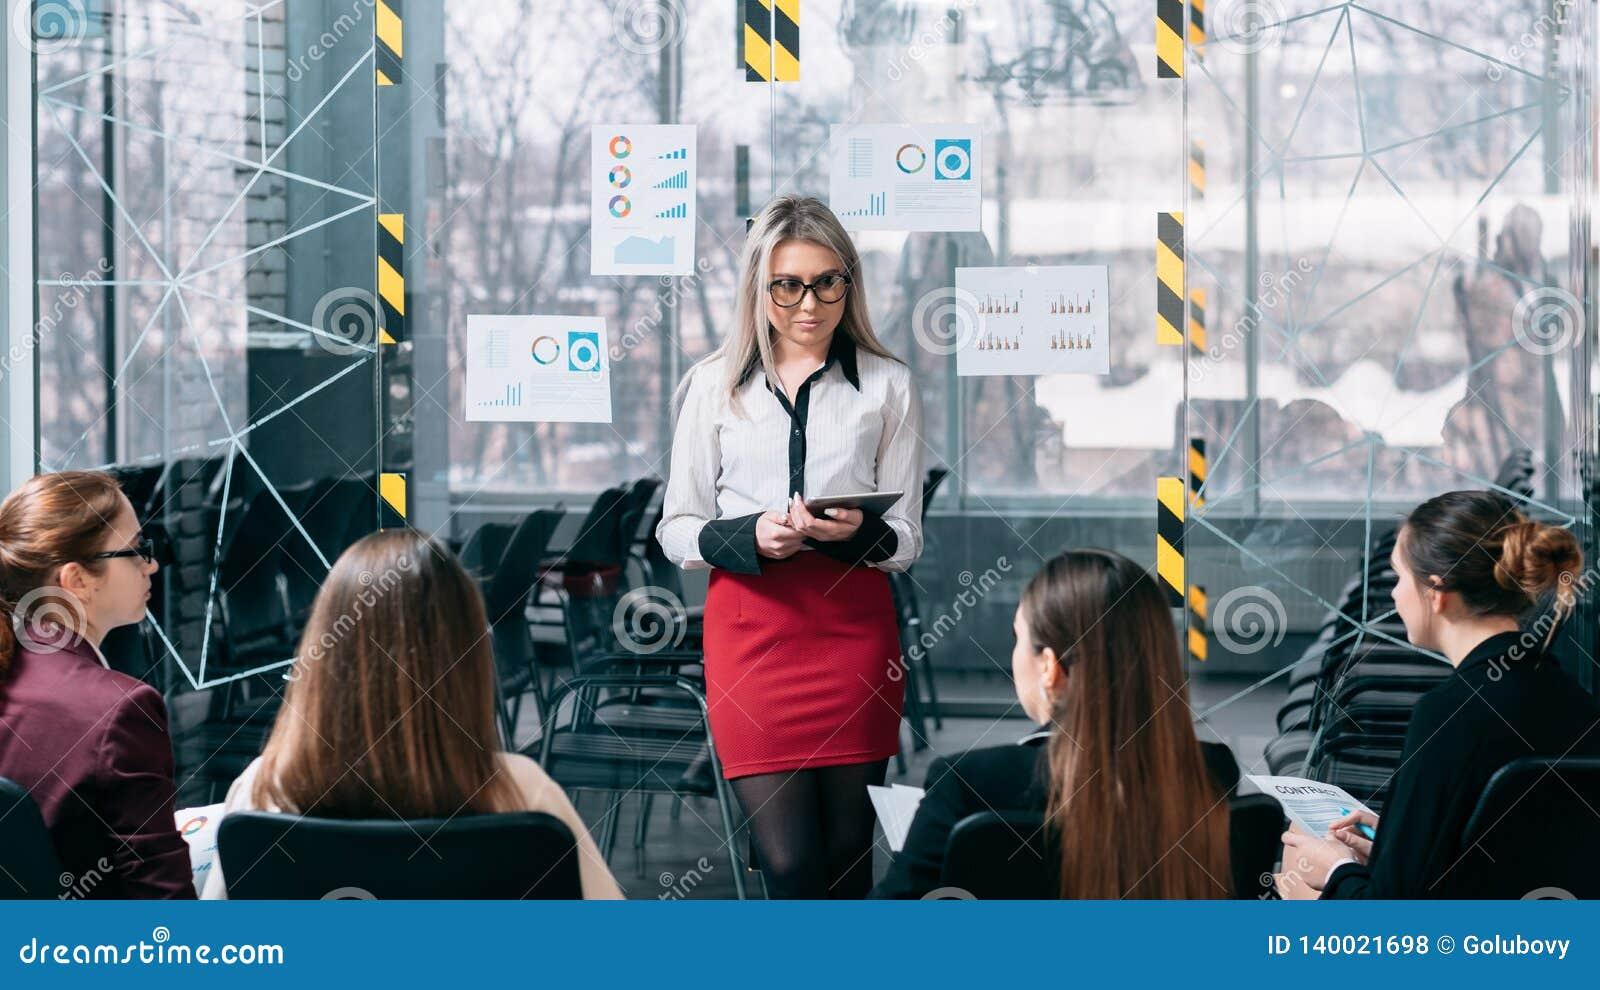 Marketing strategy seminar presentation comments